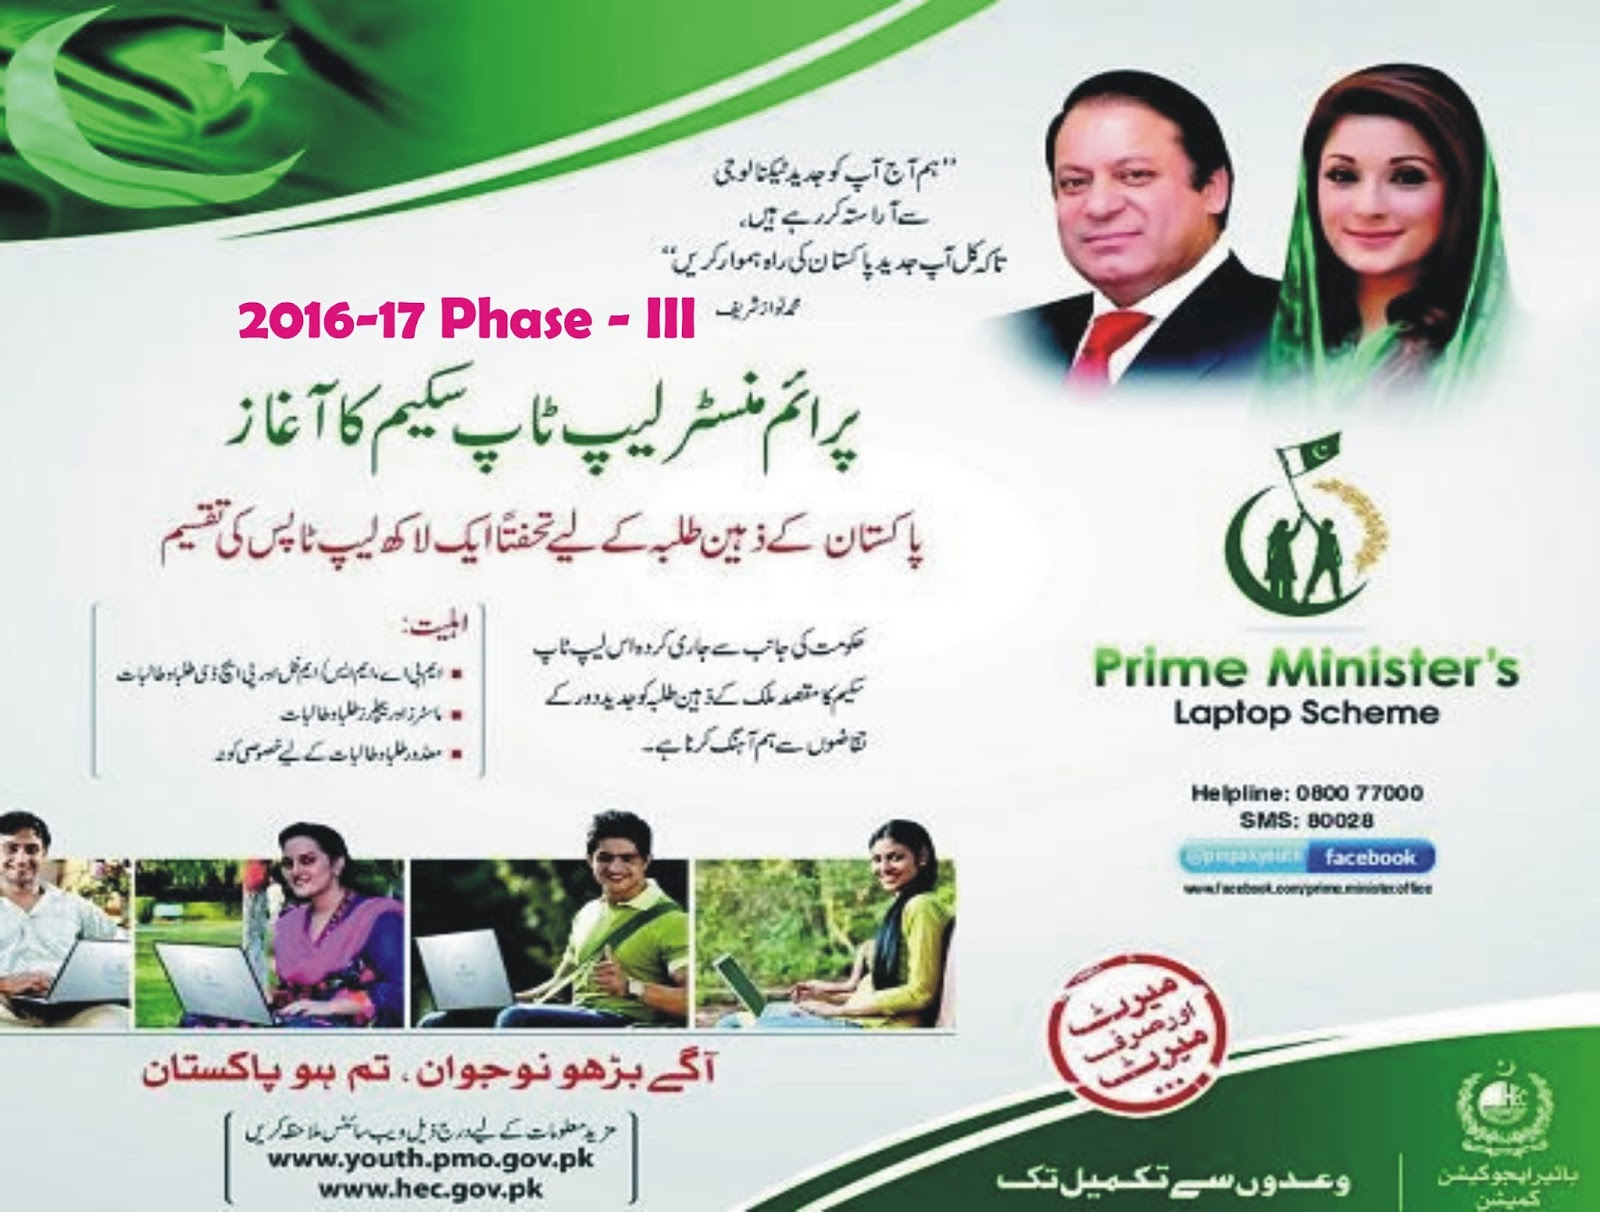 Pm laptop scheme 2016 17 phase 3 prime minister s laptop scheme apply